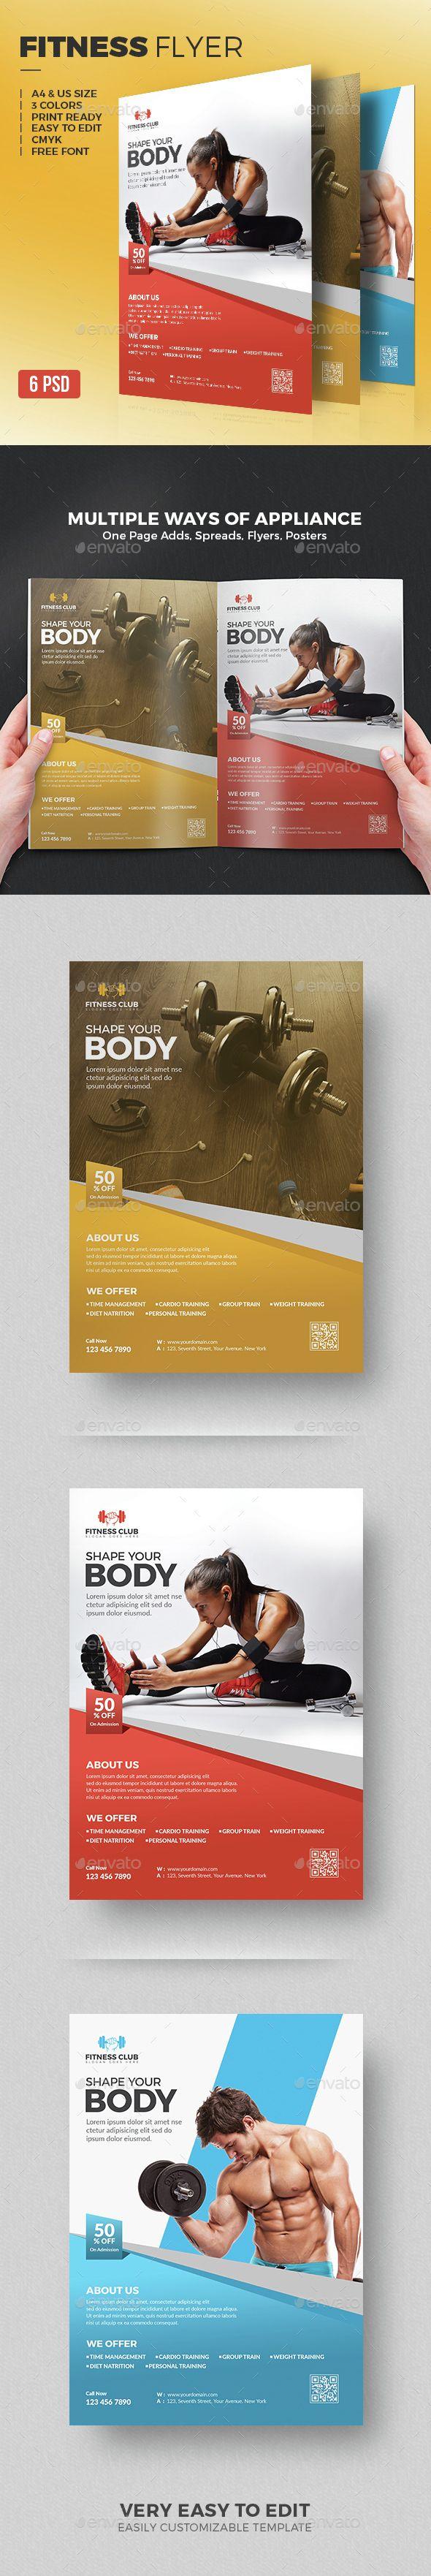 Fitness Flyer Template PSD. Download here: http://graphicriver.net/item/fitness-flyer/15360255?ref=ksioks